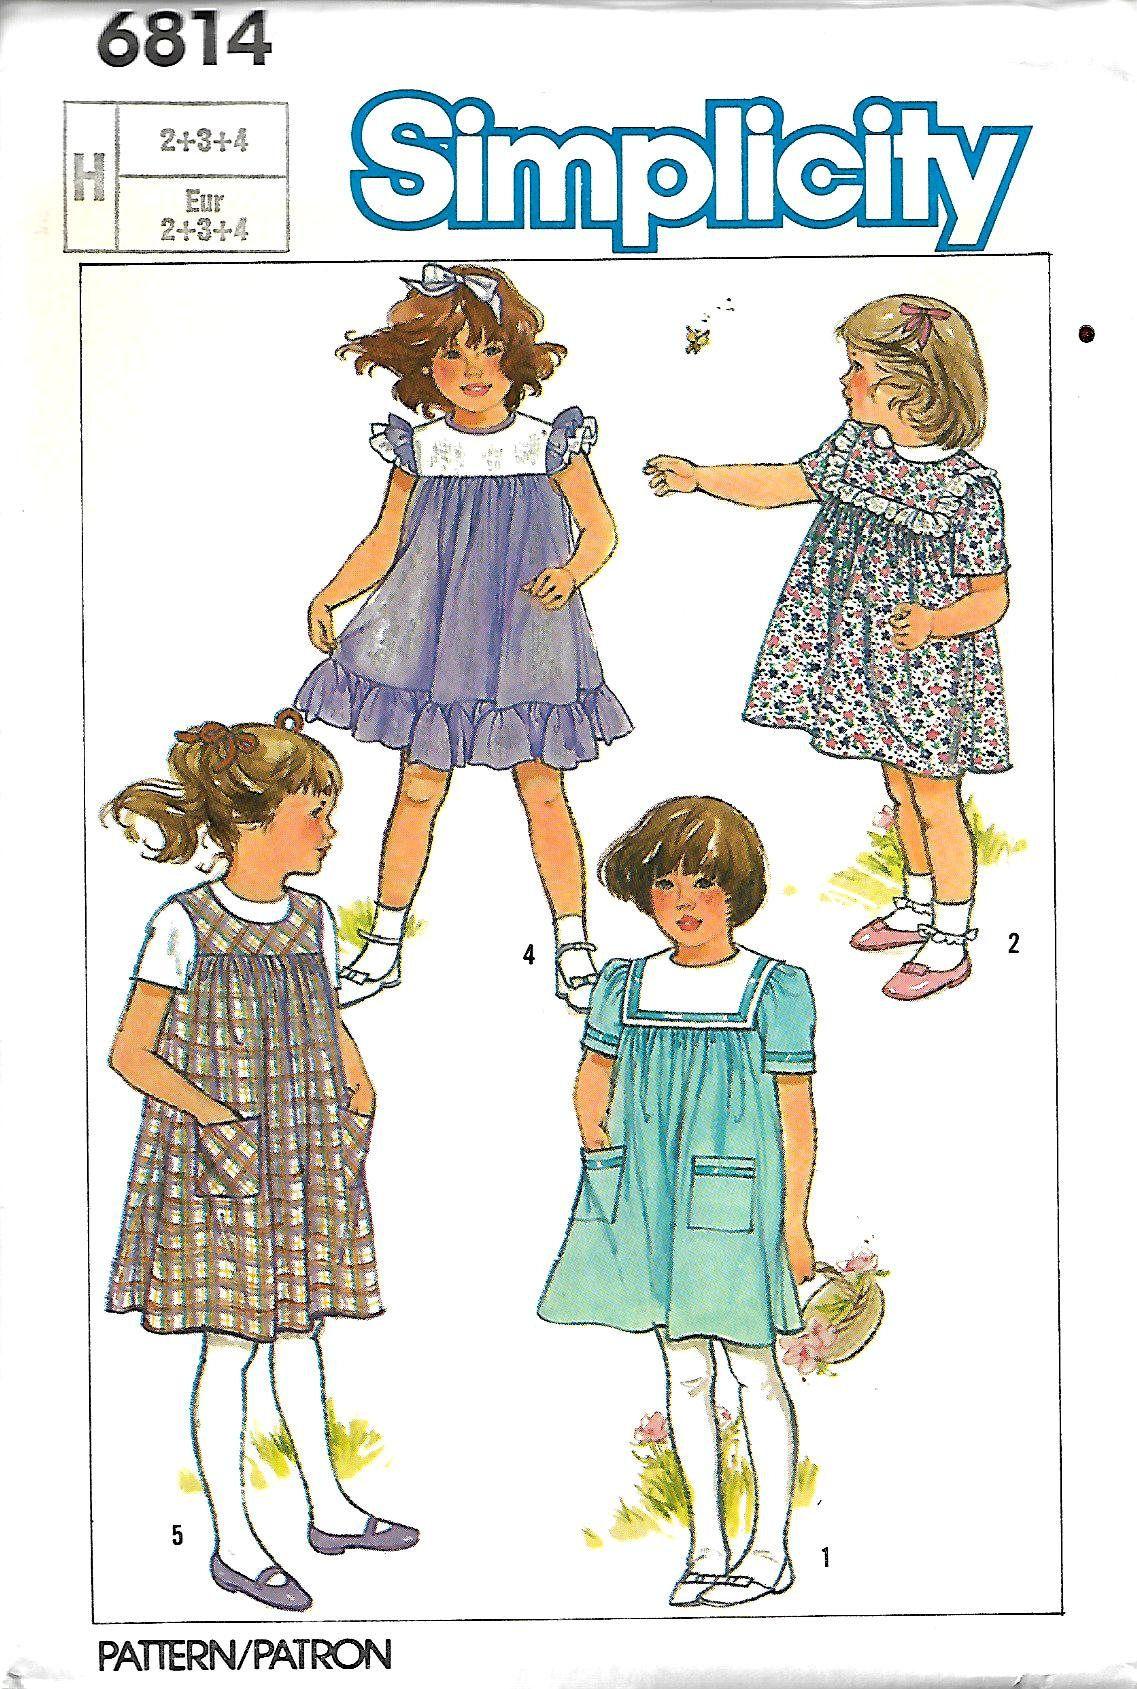 Simplicity 6814 little girls dress or pinafore sewing pattern momspatterns vintage sewing patterns simplicity 7062 vintage sewing pattern precious baby little girls high yoked flared smock top blouse dress jeuxipadfo Choice Image